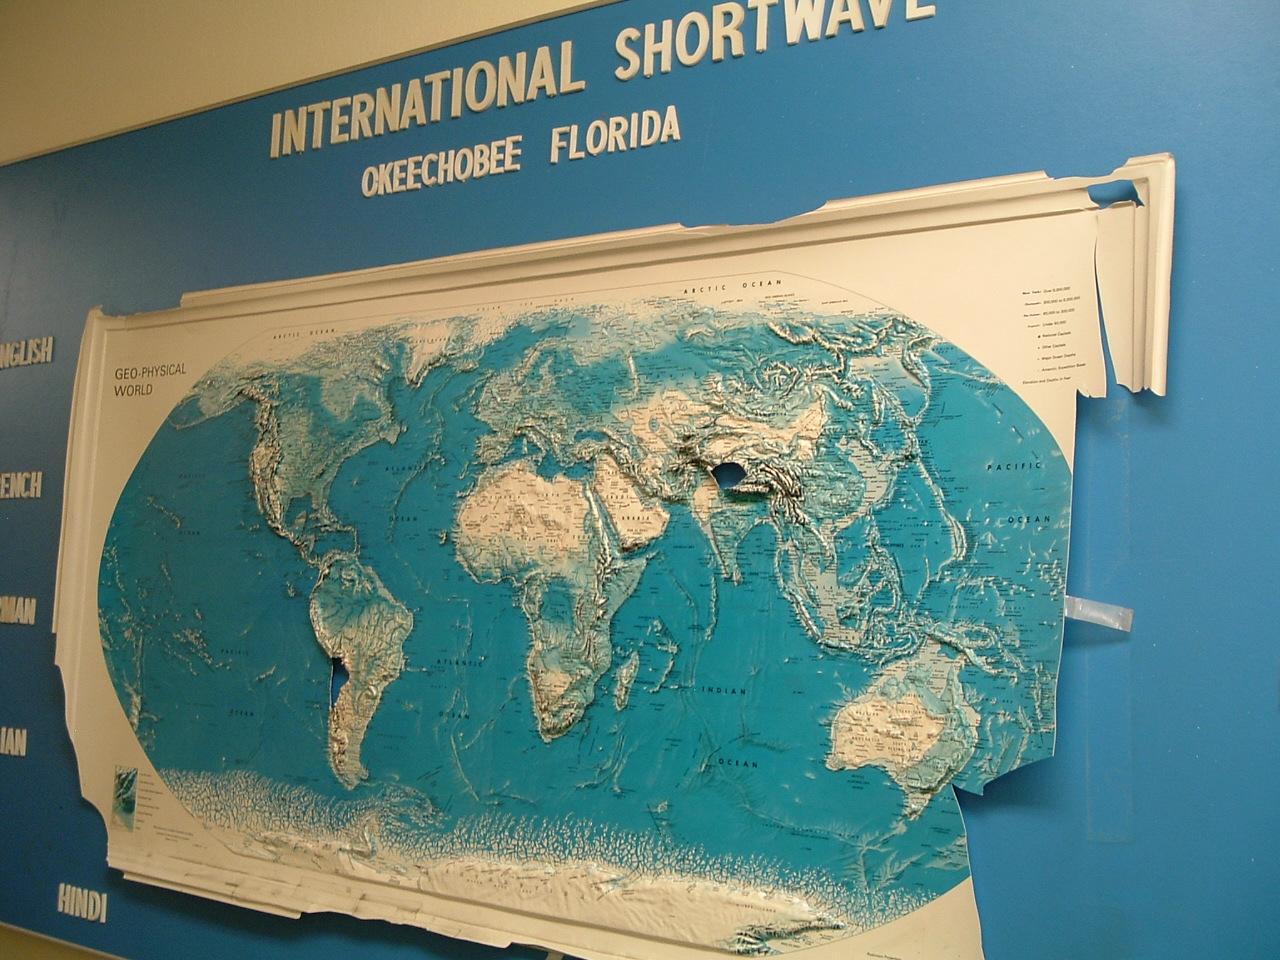 Family Radio to Sell Shortwave Station WYFR to Radio Miami